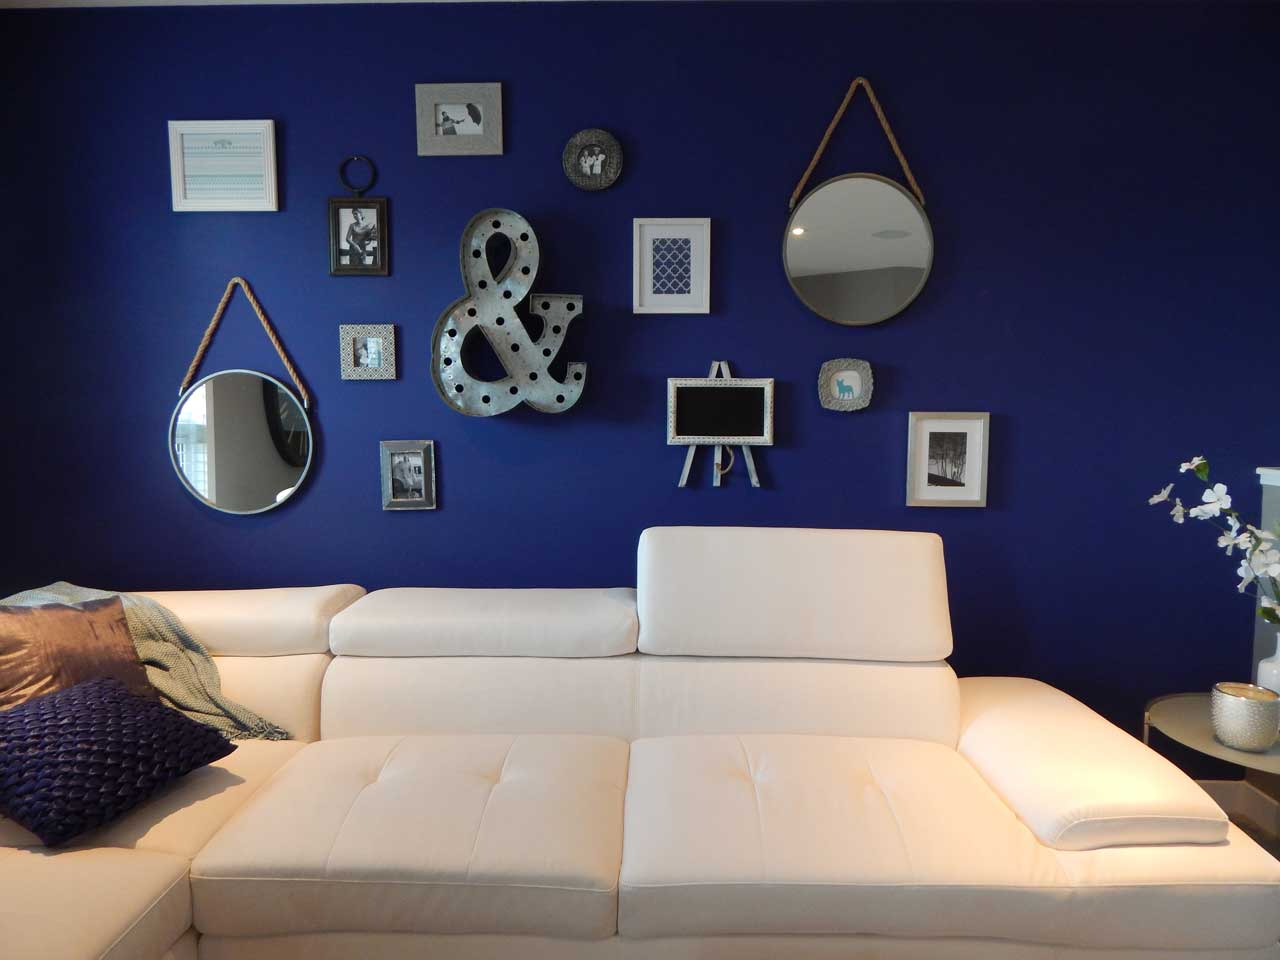 interior decor ideas for military spouses